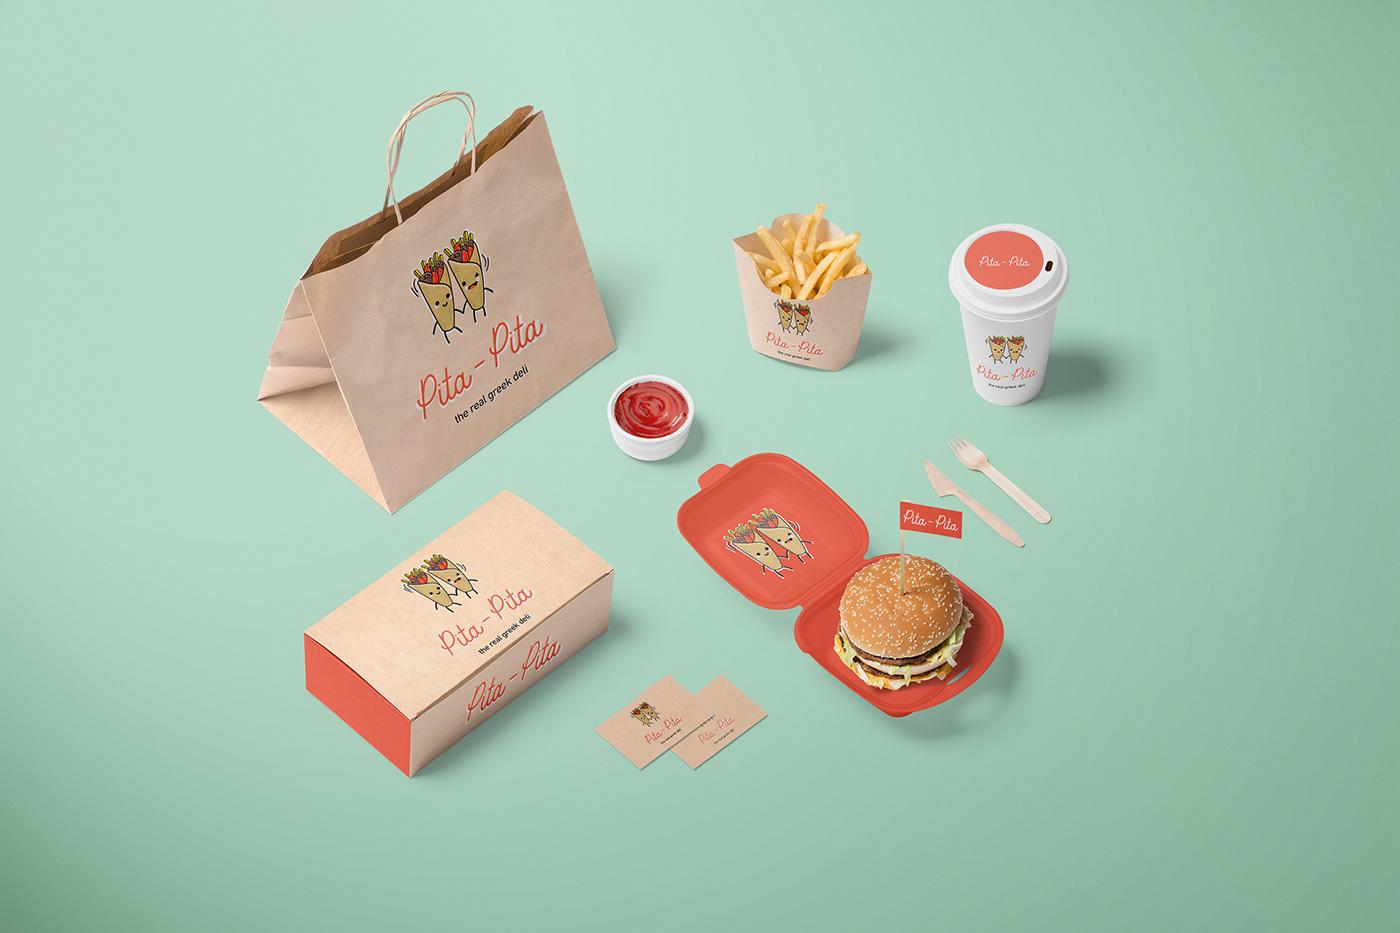 branding  Fast food burger pita greek food Food  germany Trikala logo Greece